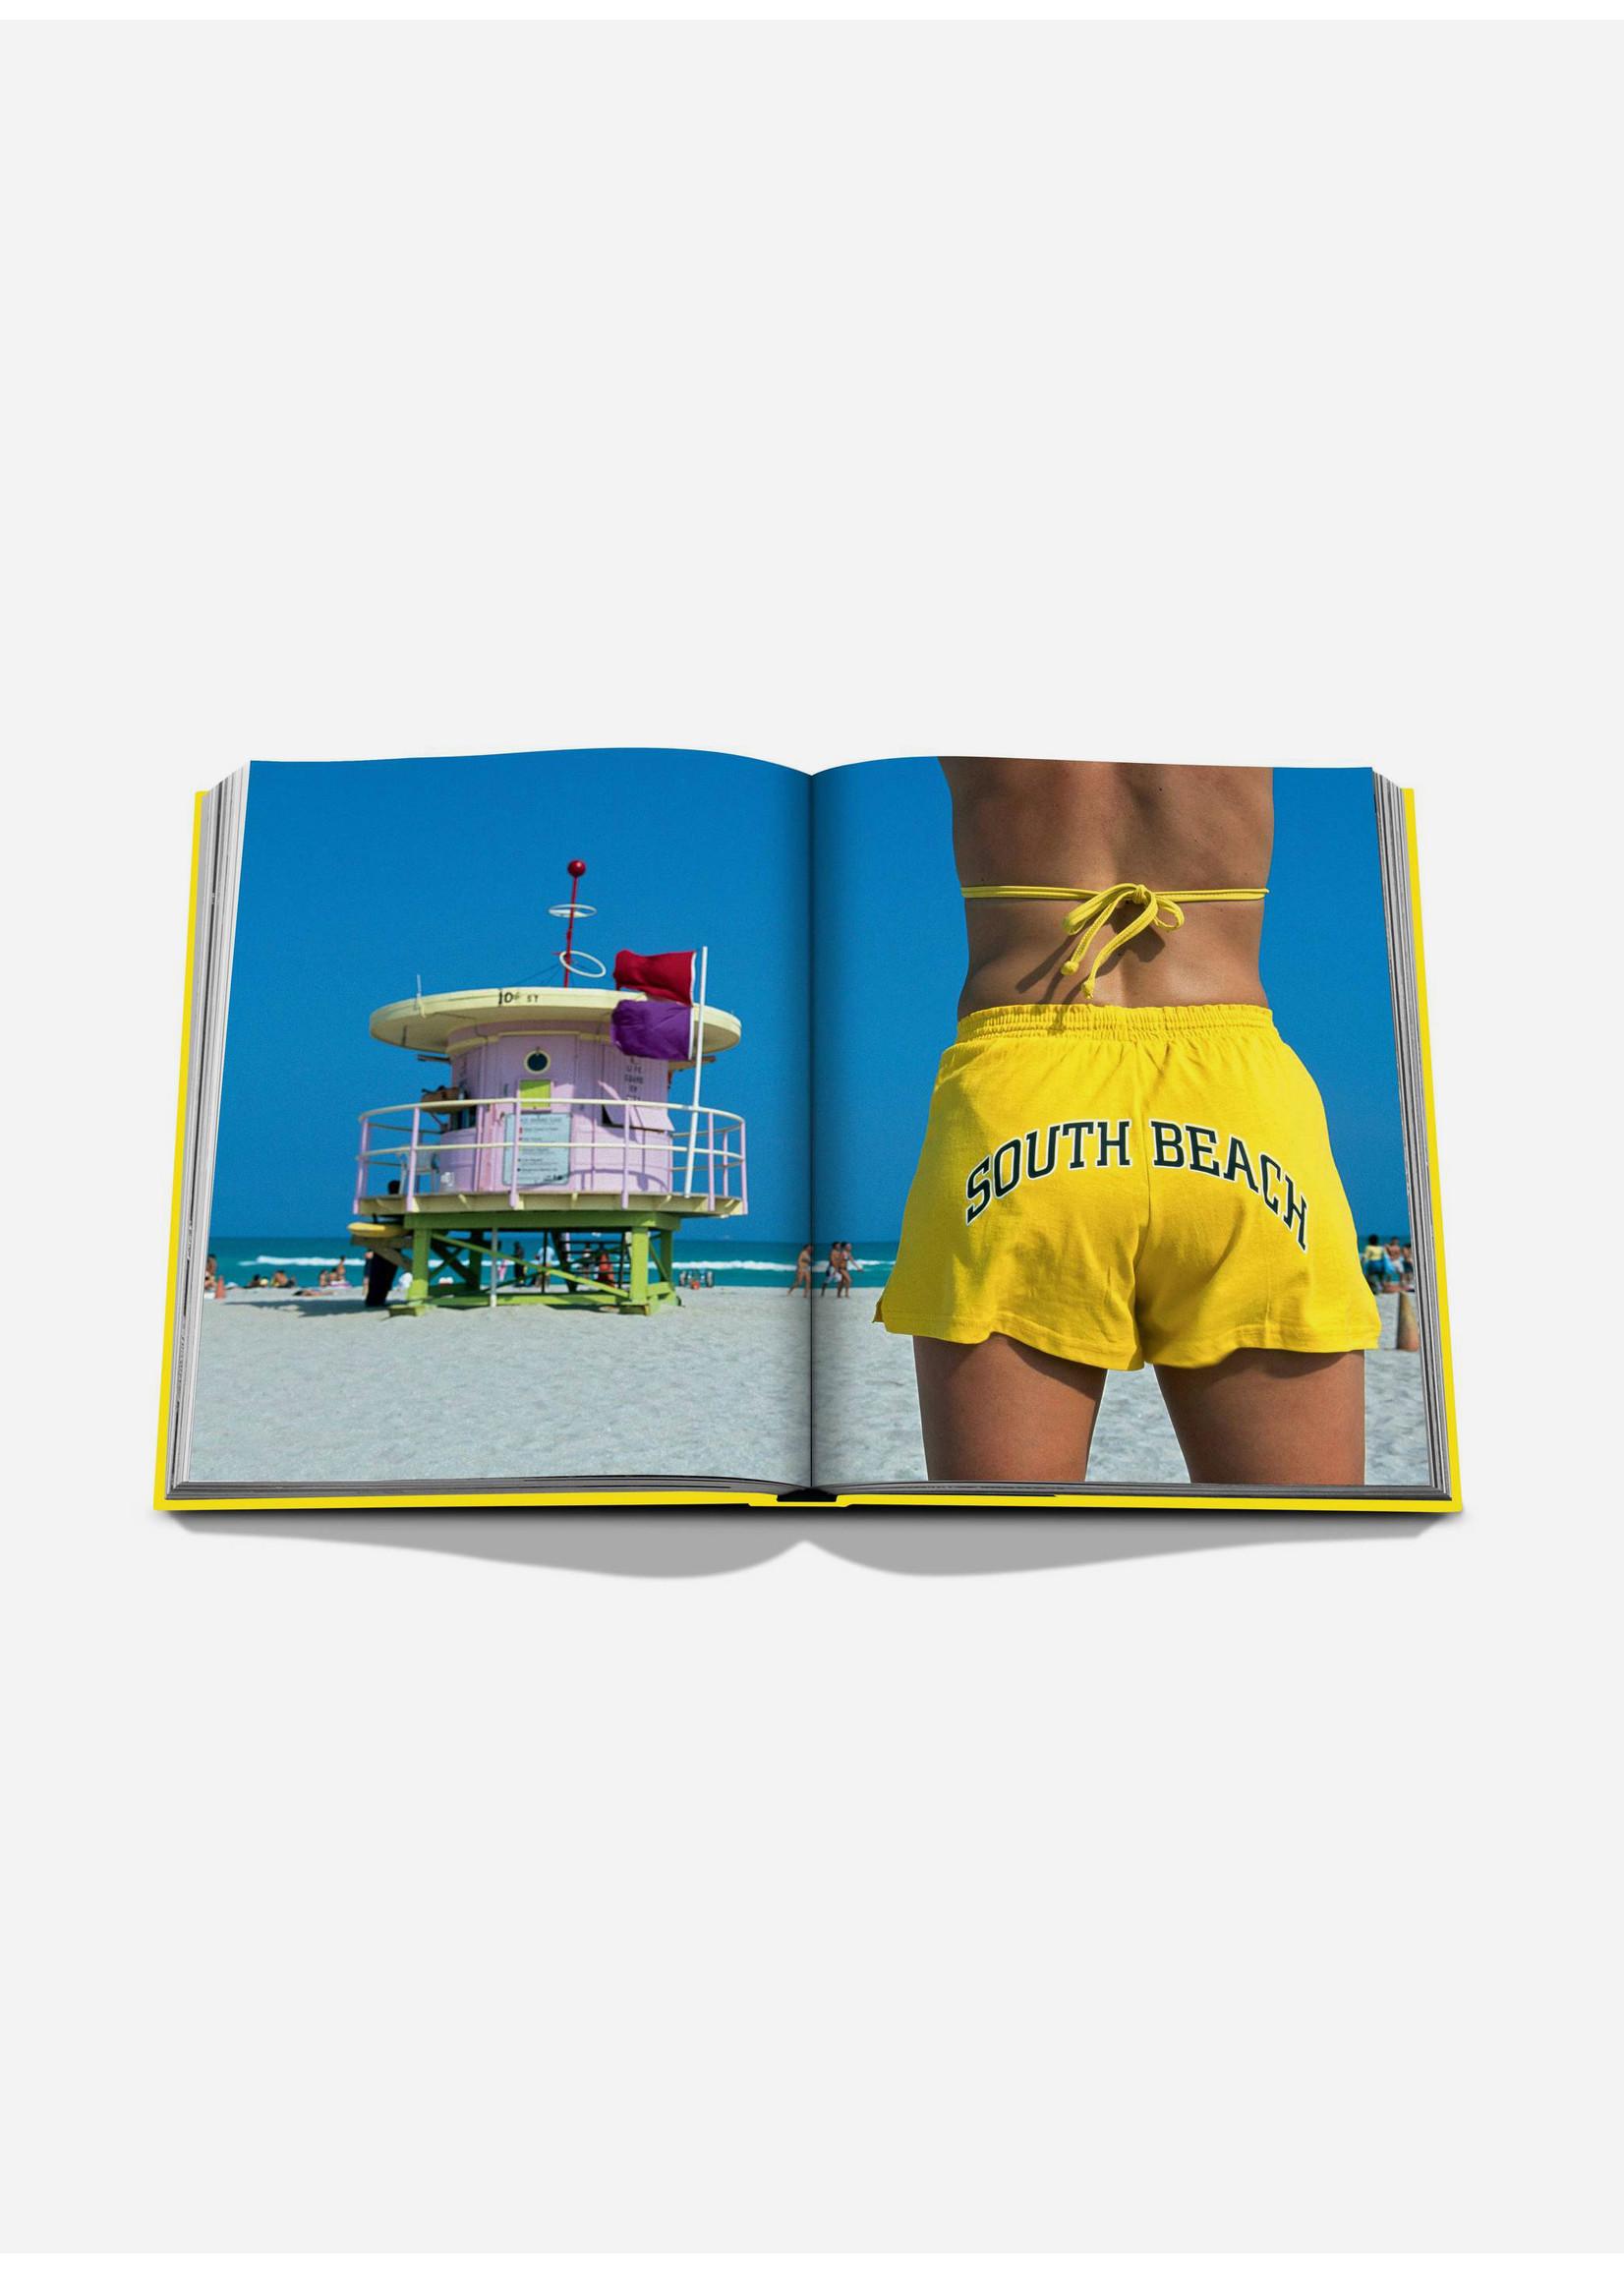 Assouline Books Miami Beach